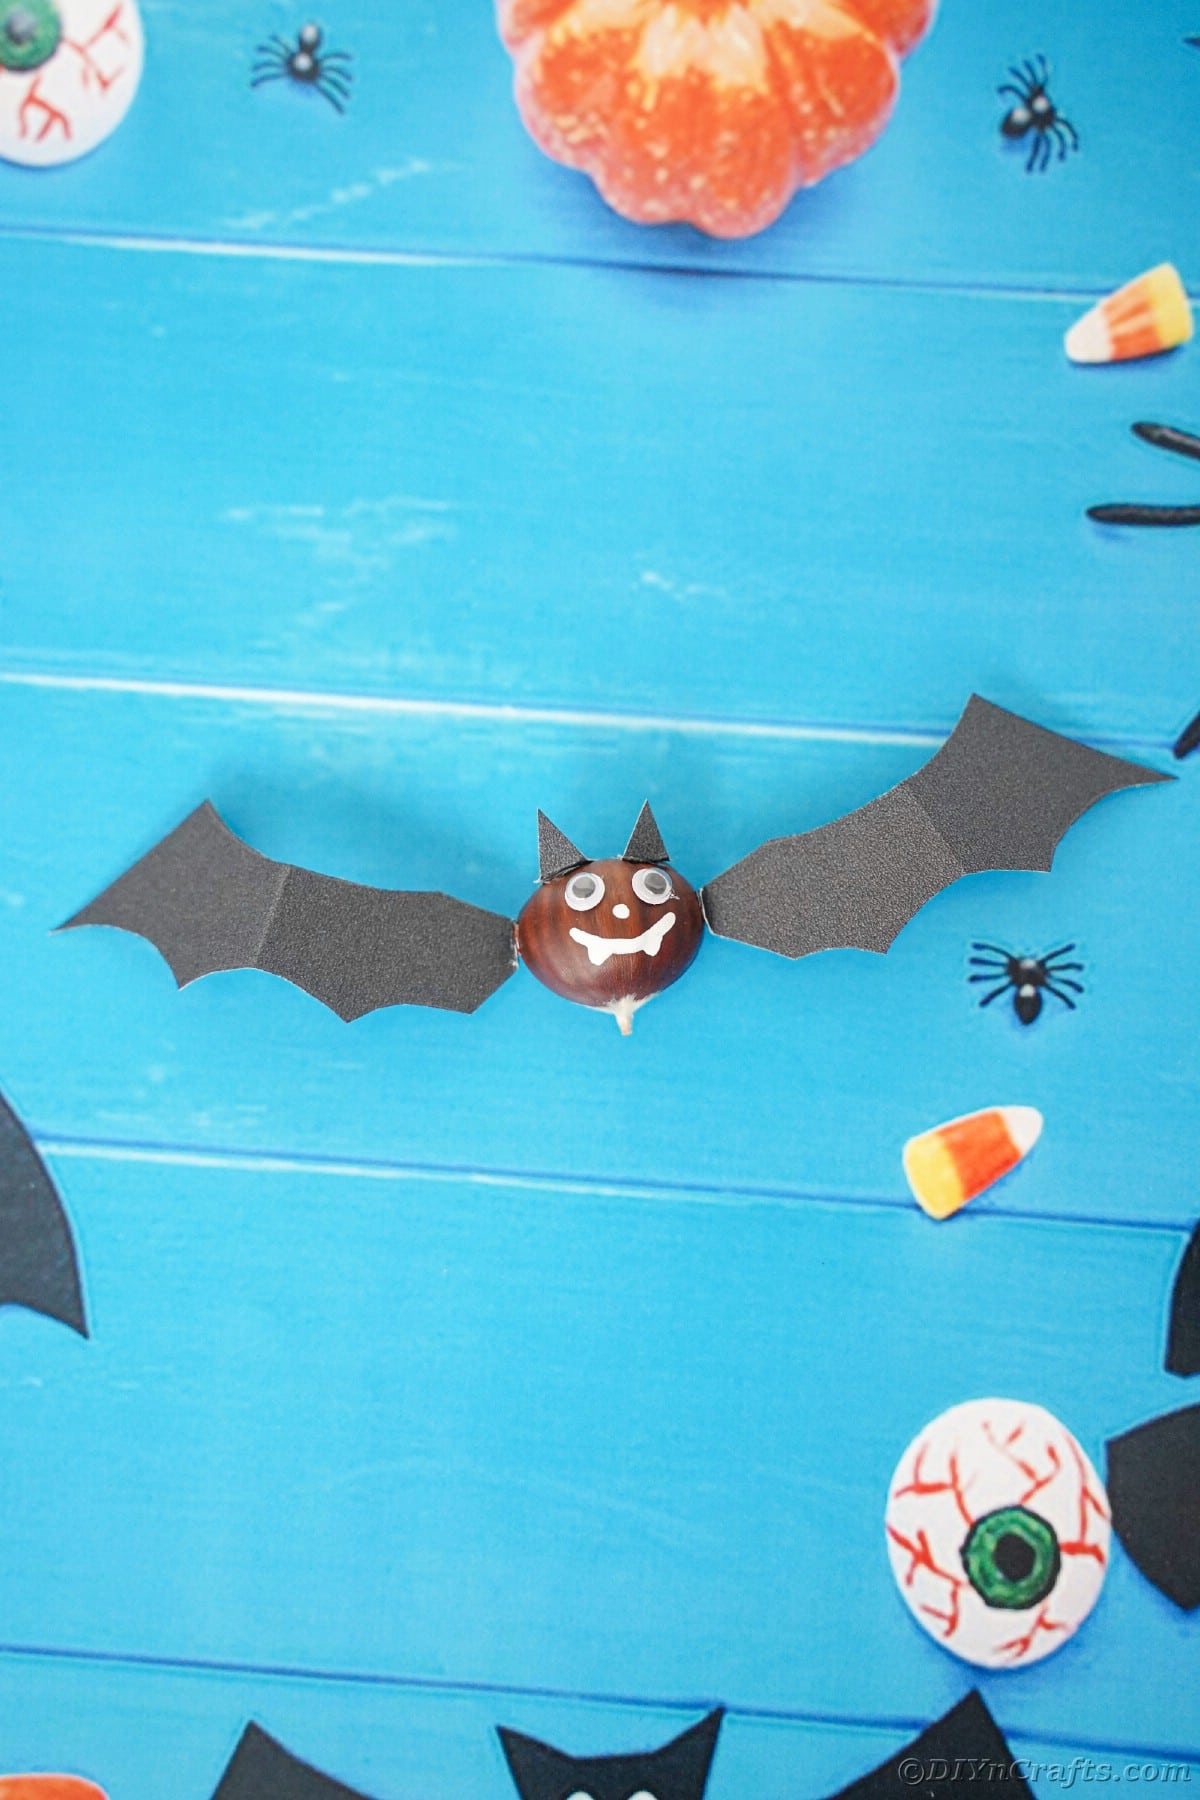 Black bat craft laying on blue paper with fake pumpkins